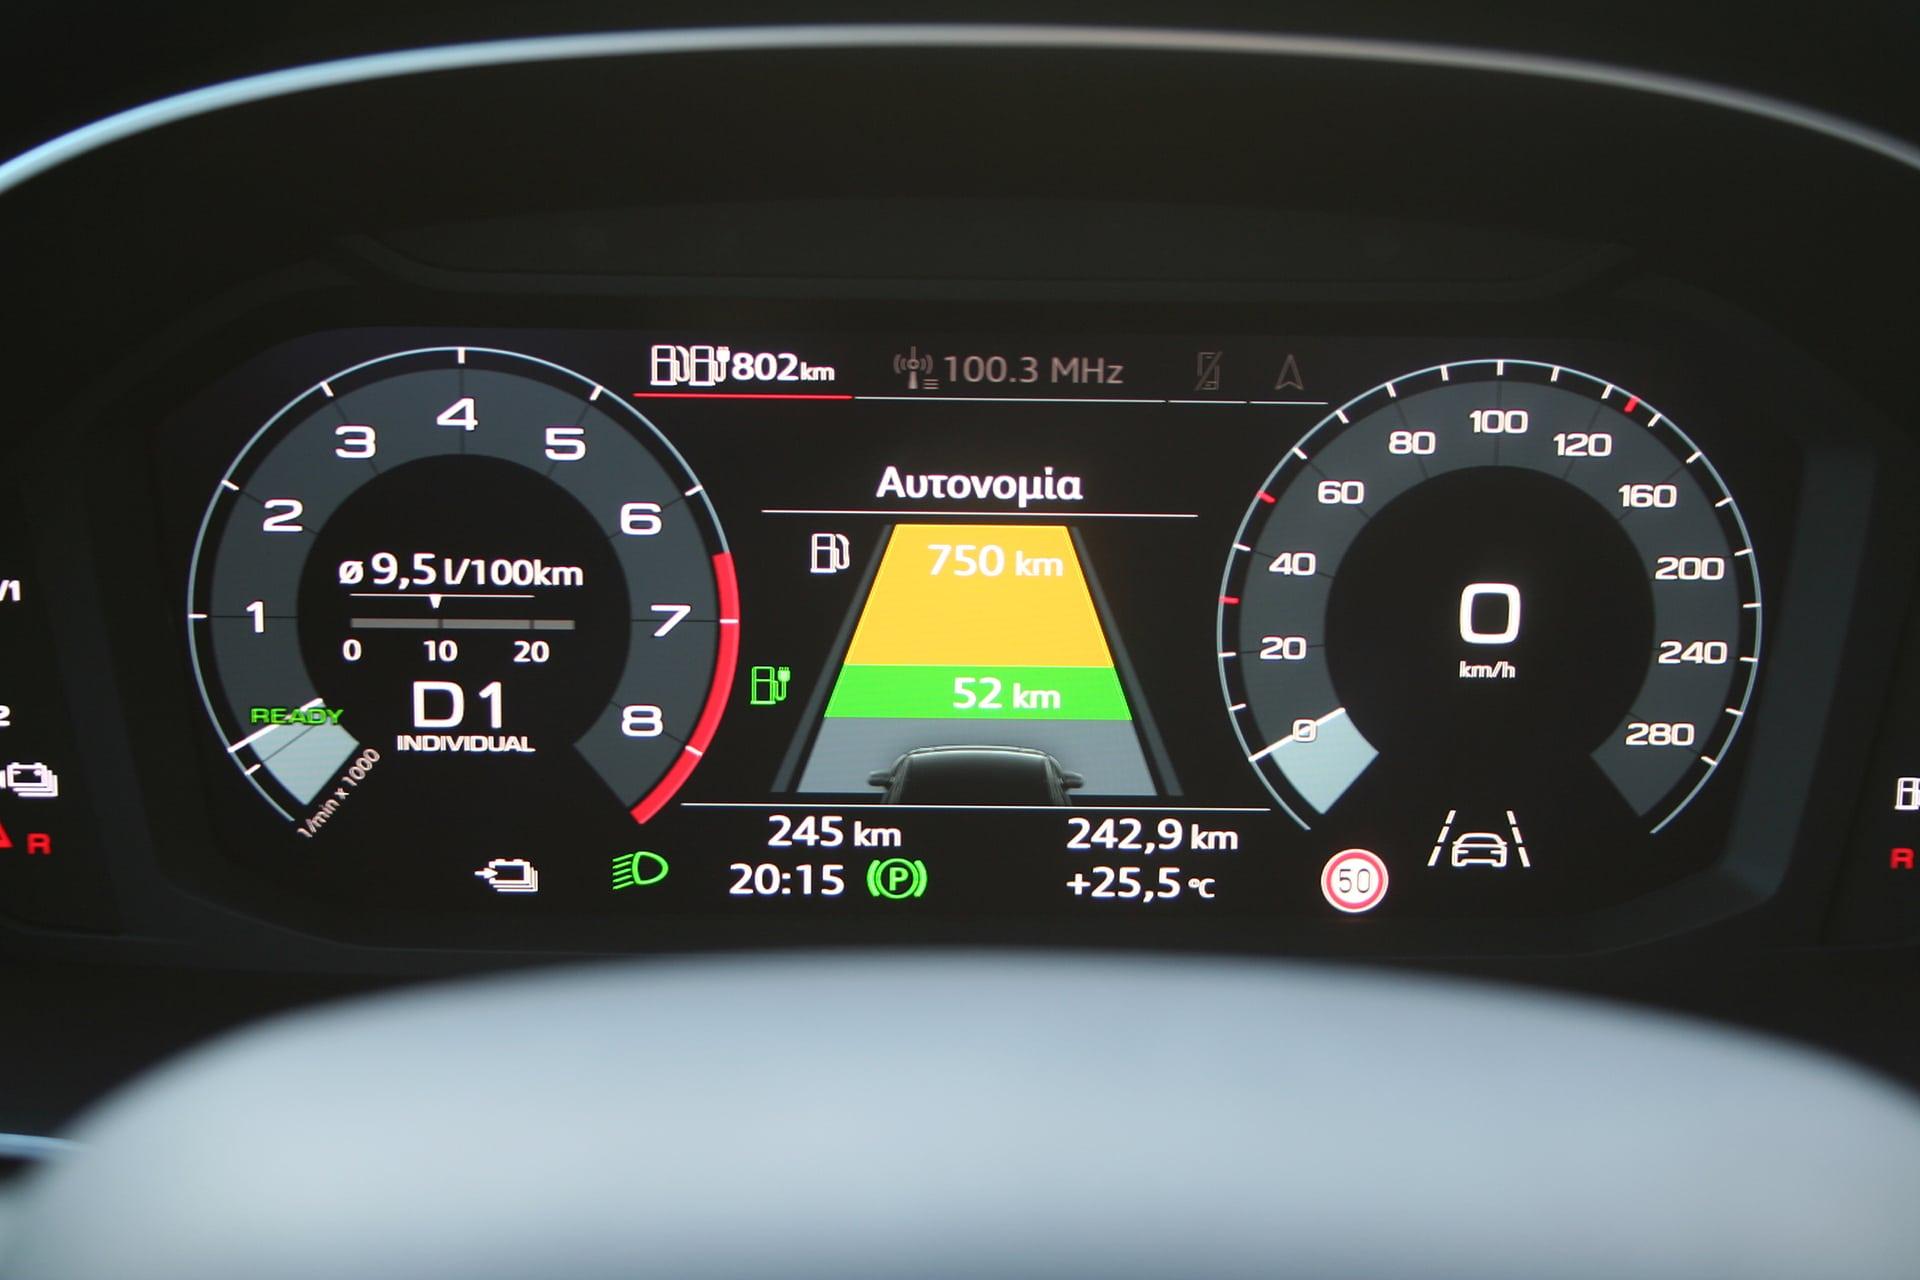 AUDI Q3 TFSI e 45 Αυτά είναι τα plug-in hybrid Audi Q3 TFSI e & Q3 Sportback TFSI e Audi, Audi Q3, Hybrid, plug-in hybrid, Q3, ειδήσεις, Νέα, υβριδικό